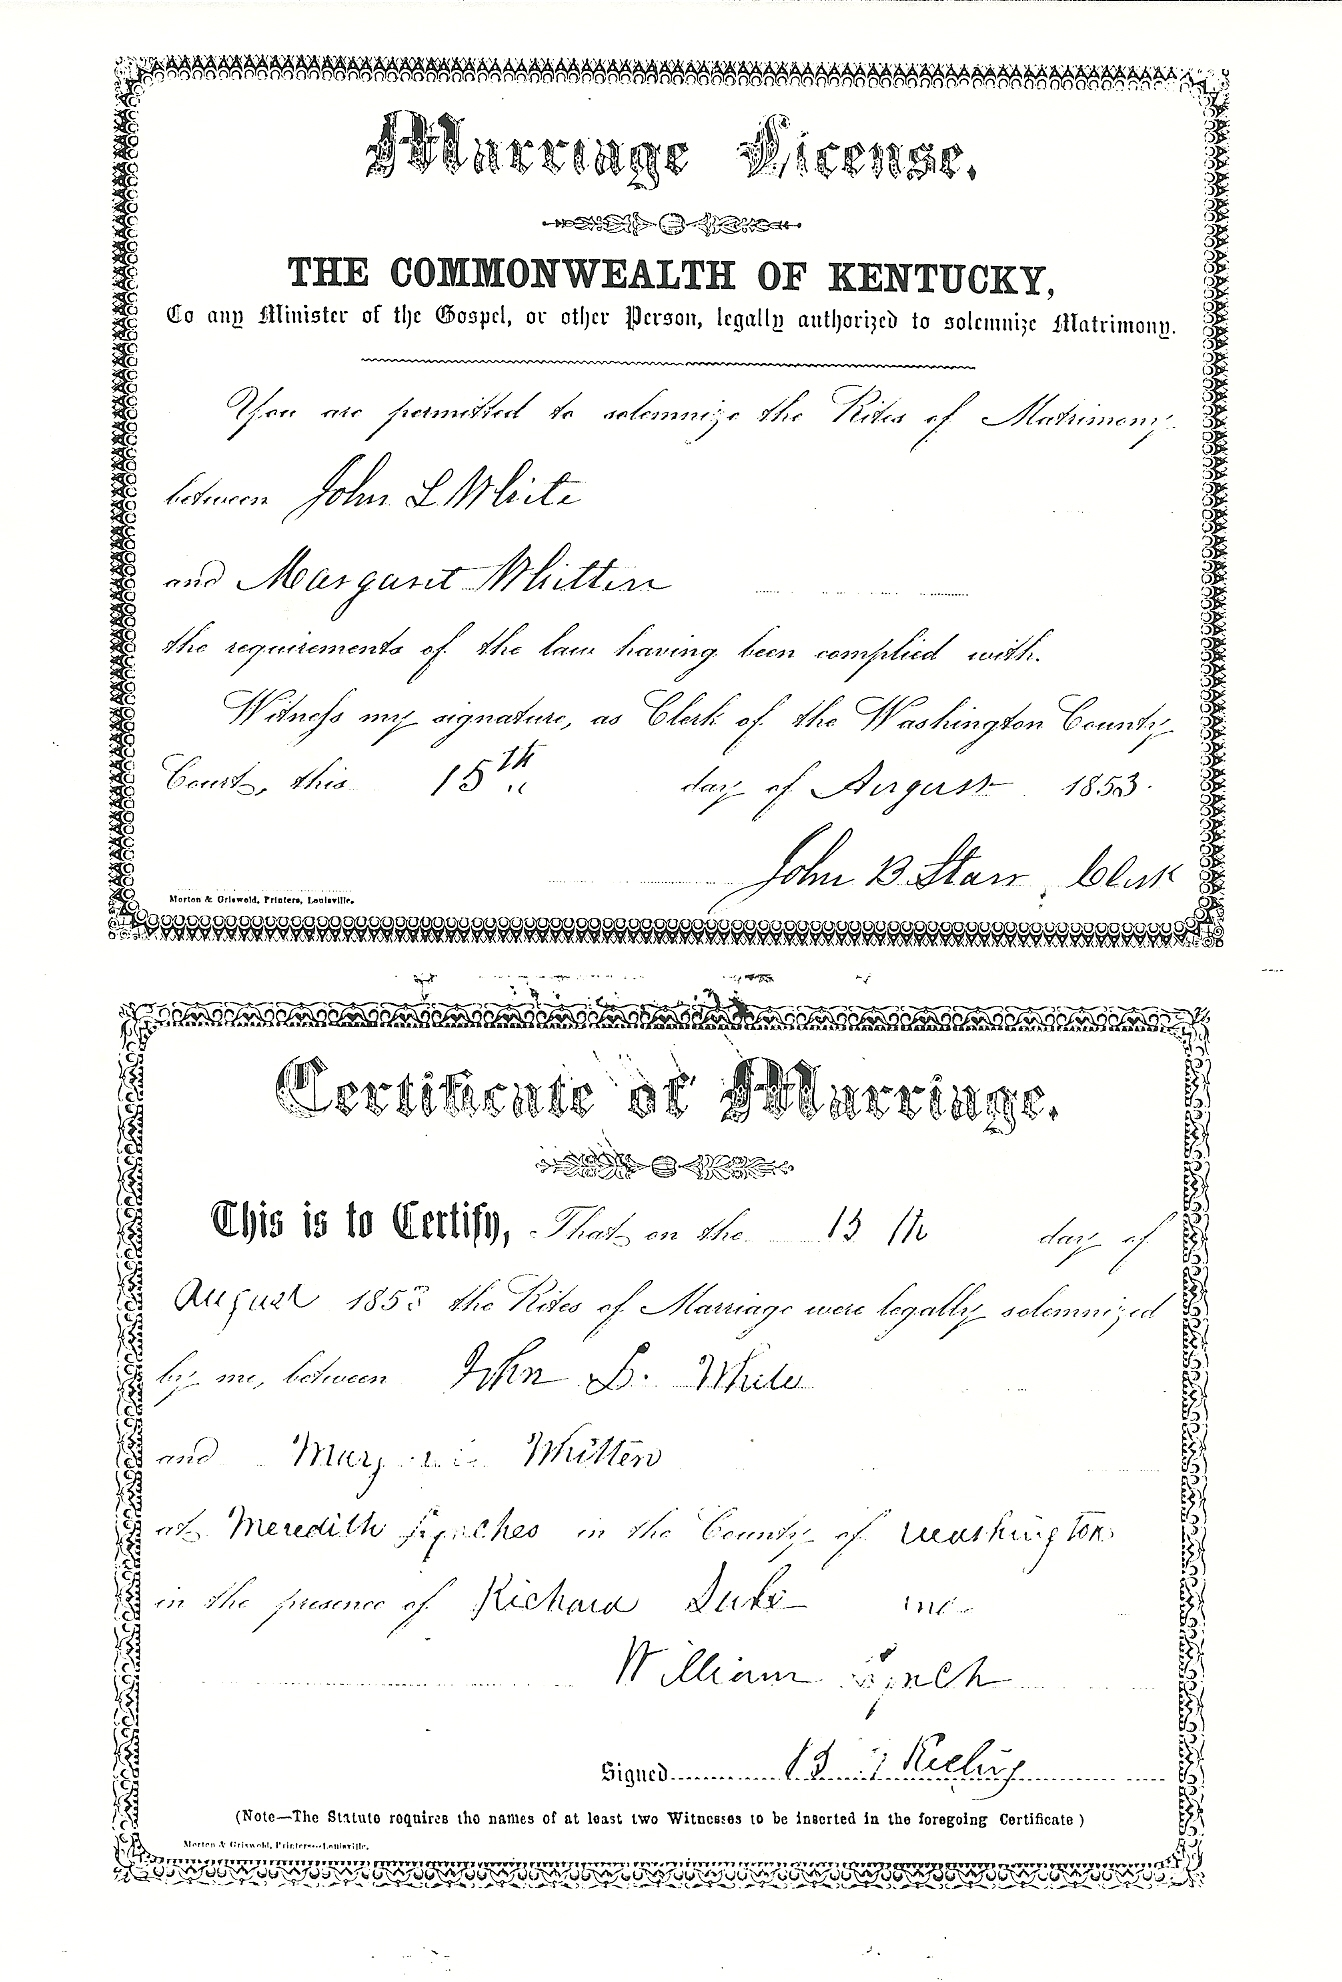 White Whitten 1853 Marriage Kentucky Kindred Genealogy